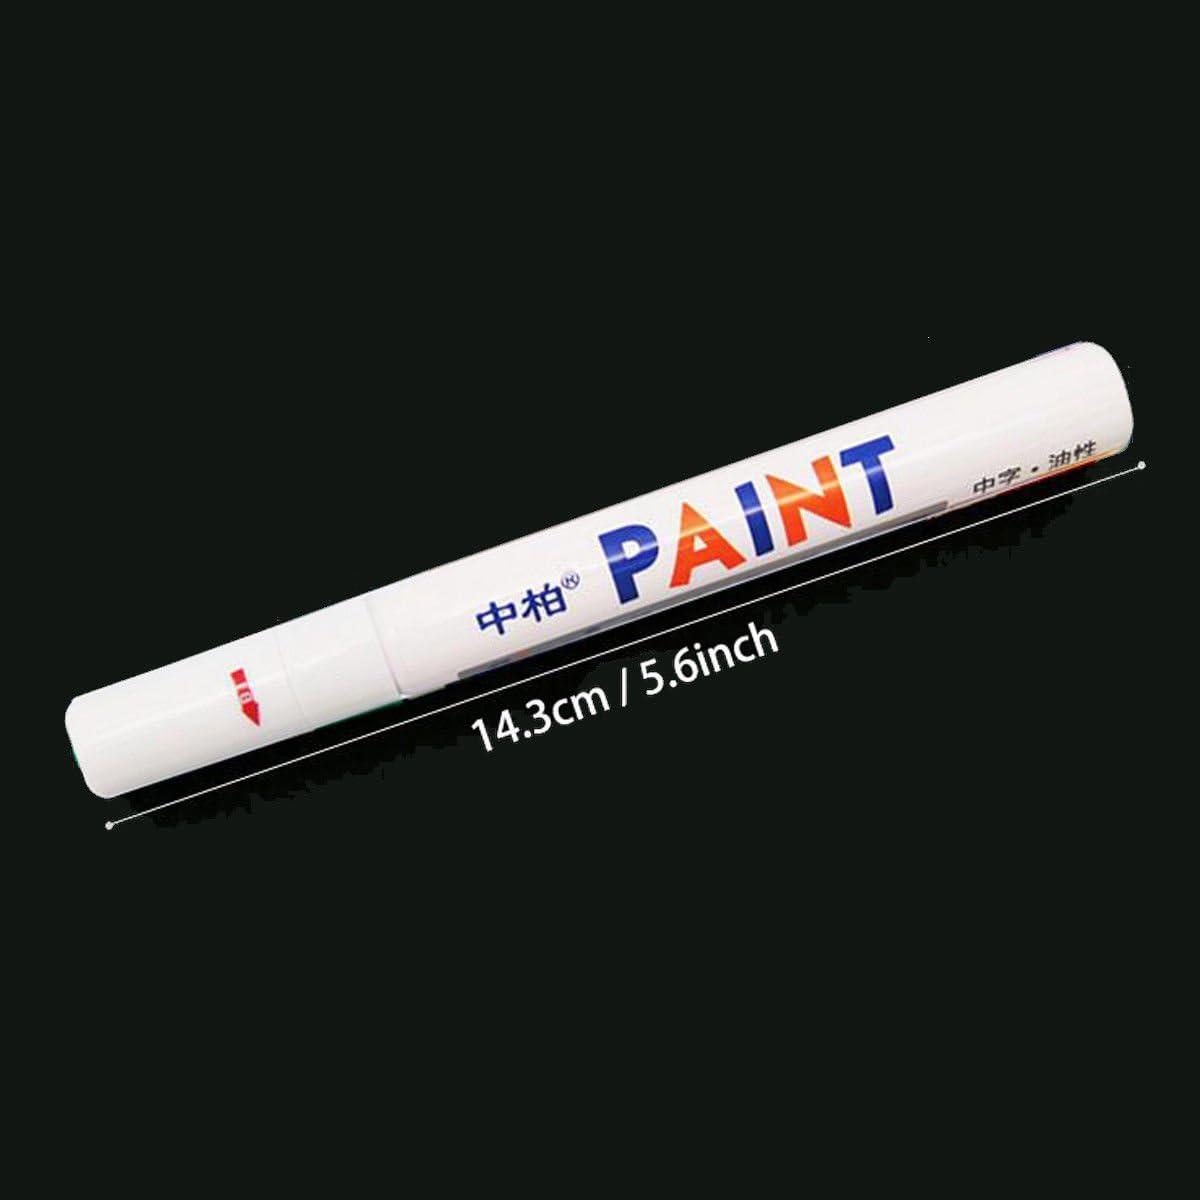 6X White Paint Pen Marker Waterproof Permanent Car Tire Lettering Rubber Letter